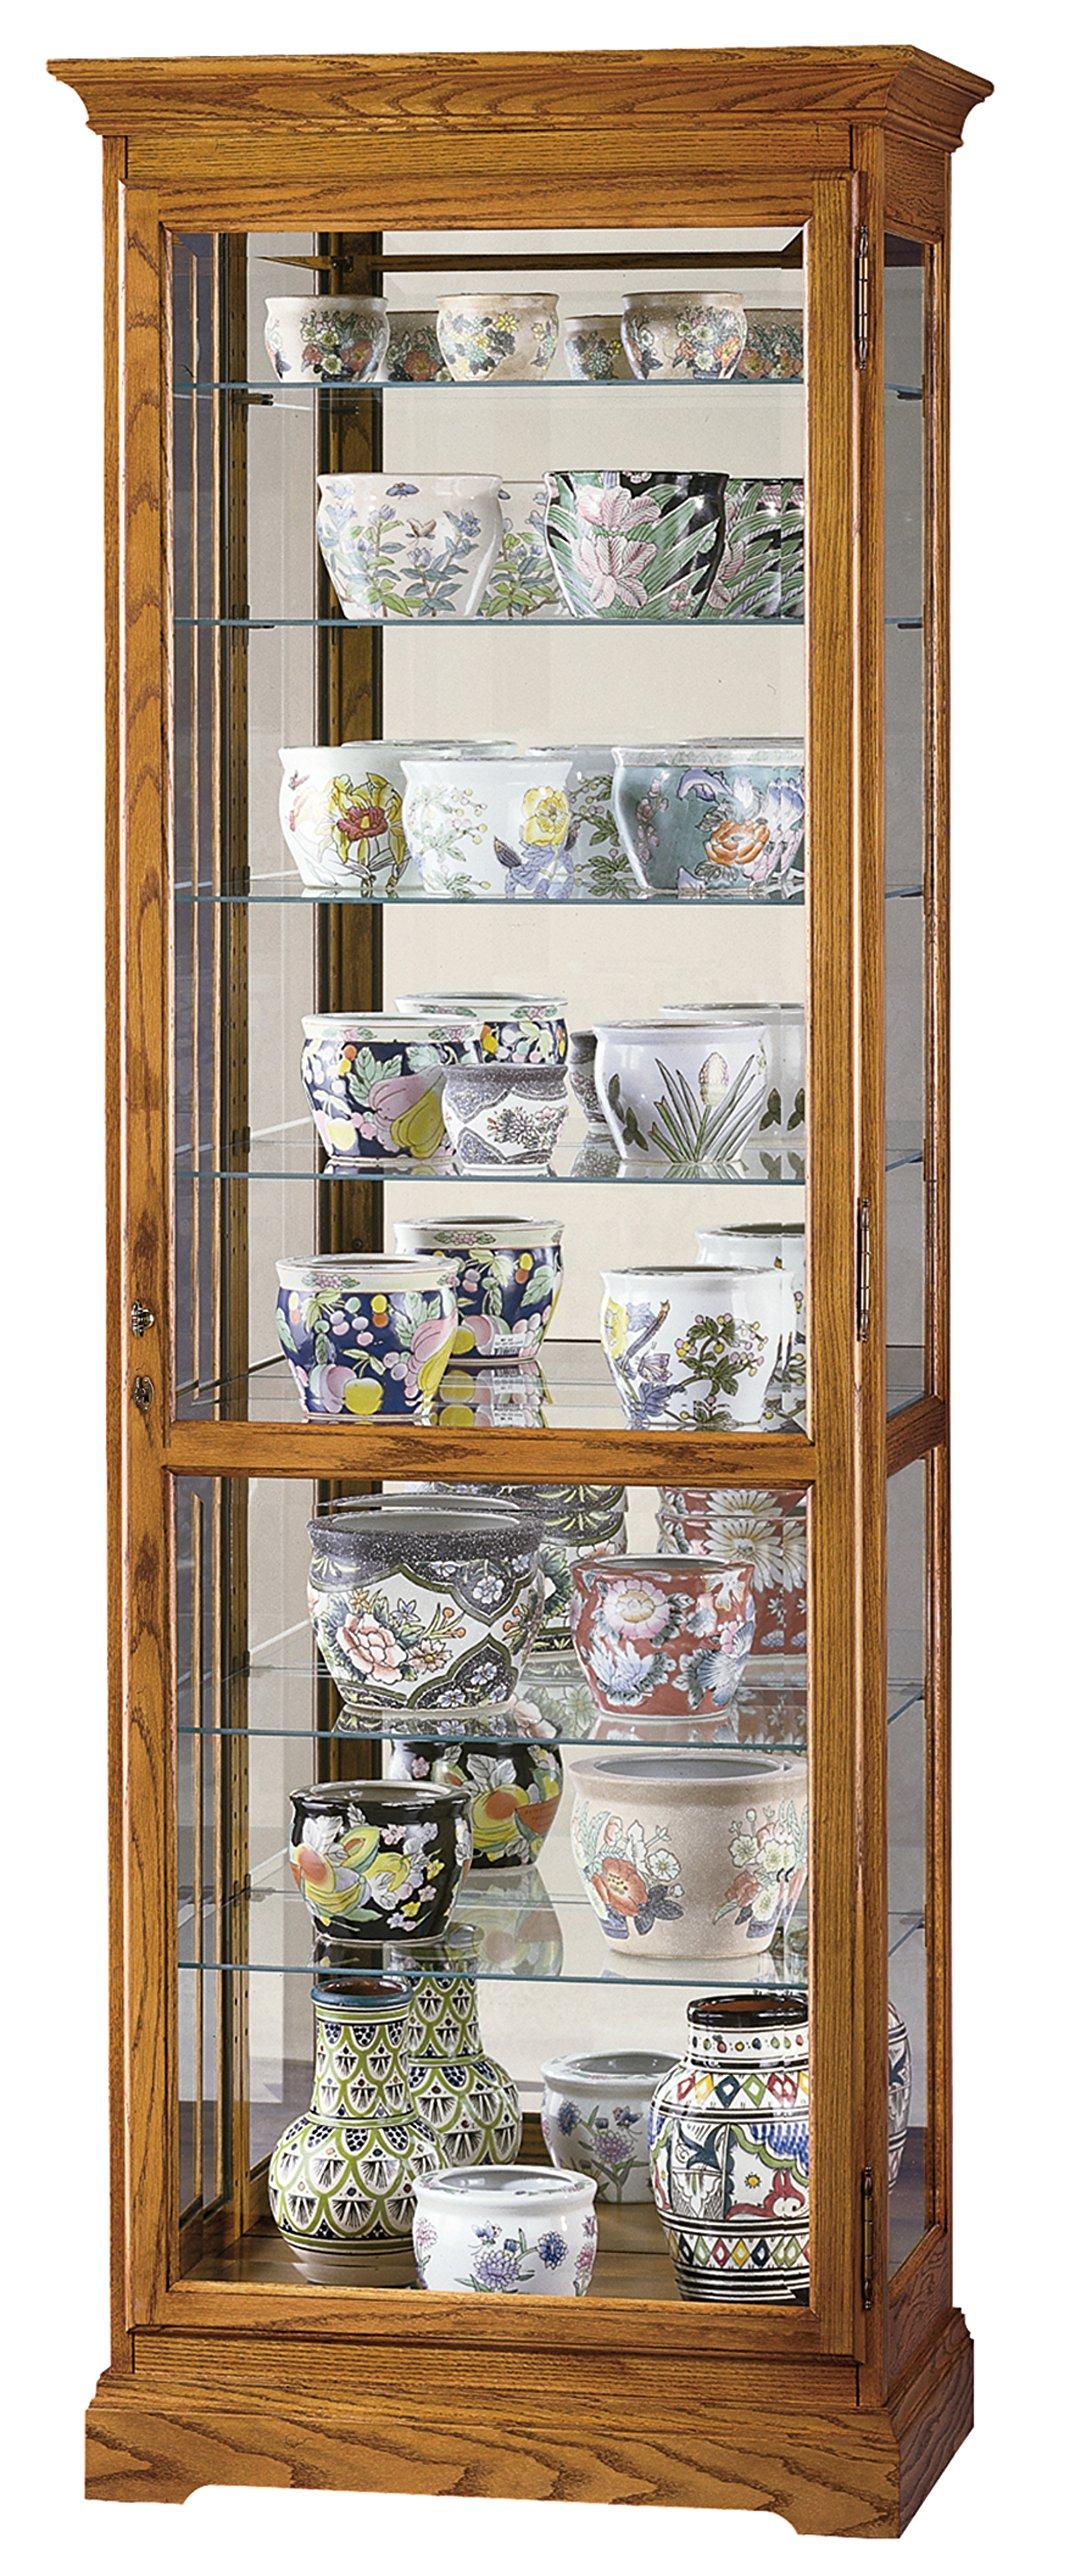 Howard Miller 680-288 Chesterfield II Curio Cabinet by Howard Miller